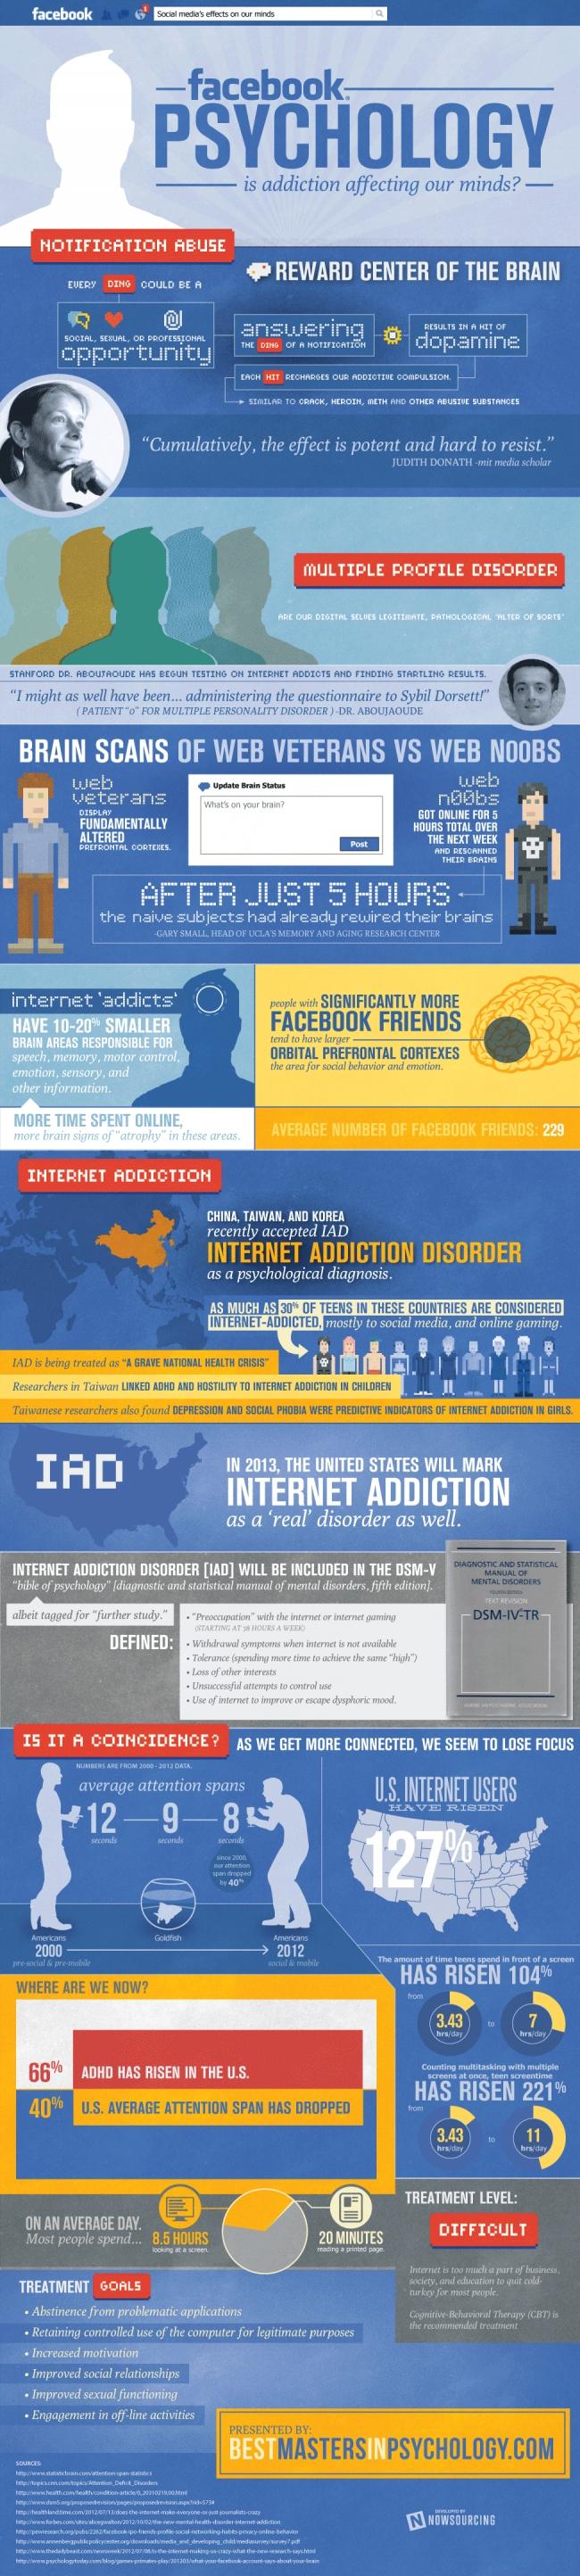 facebook-psychology